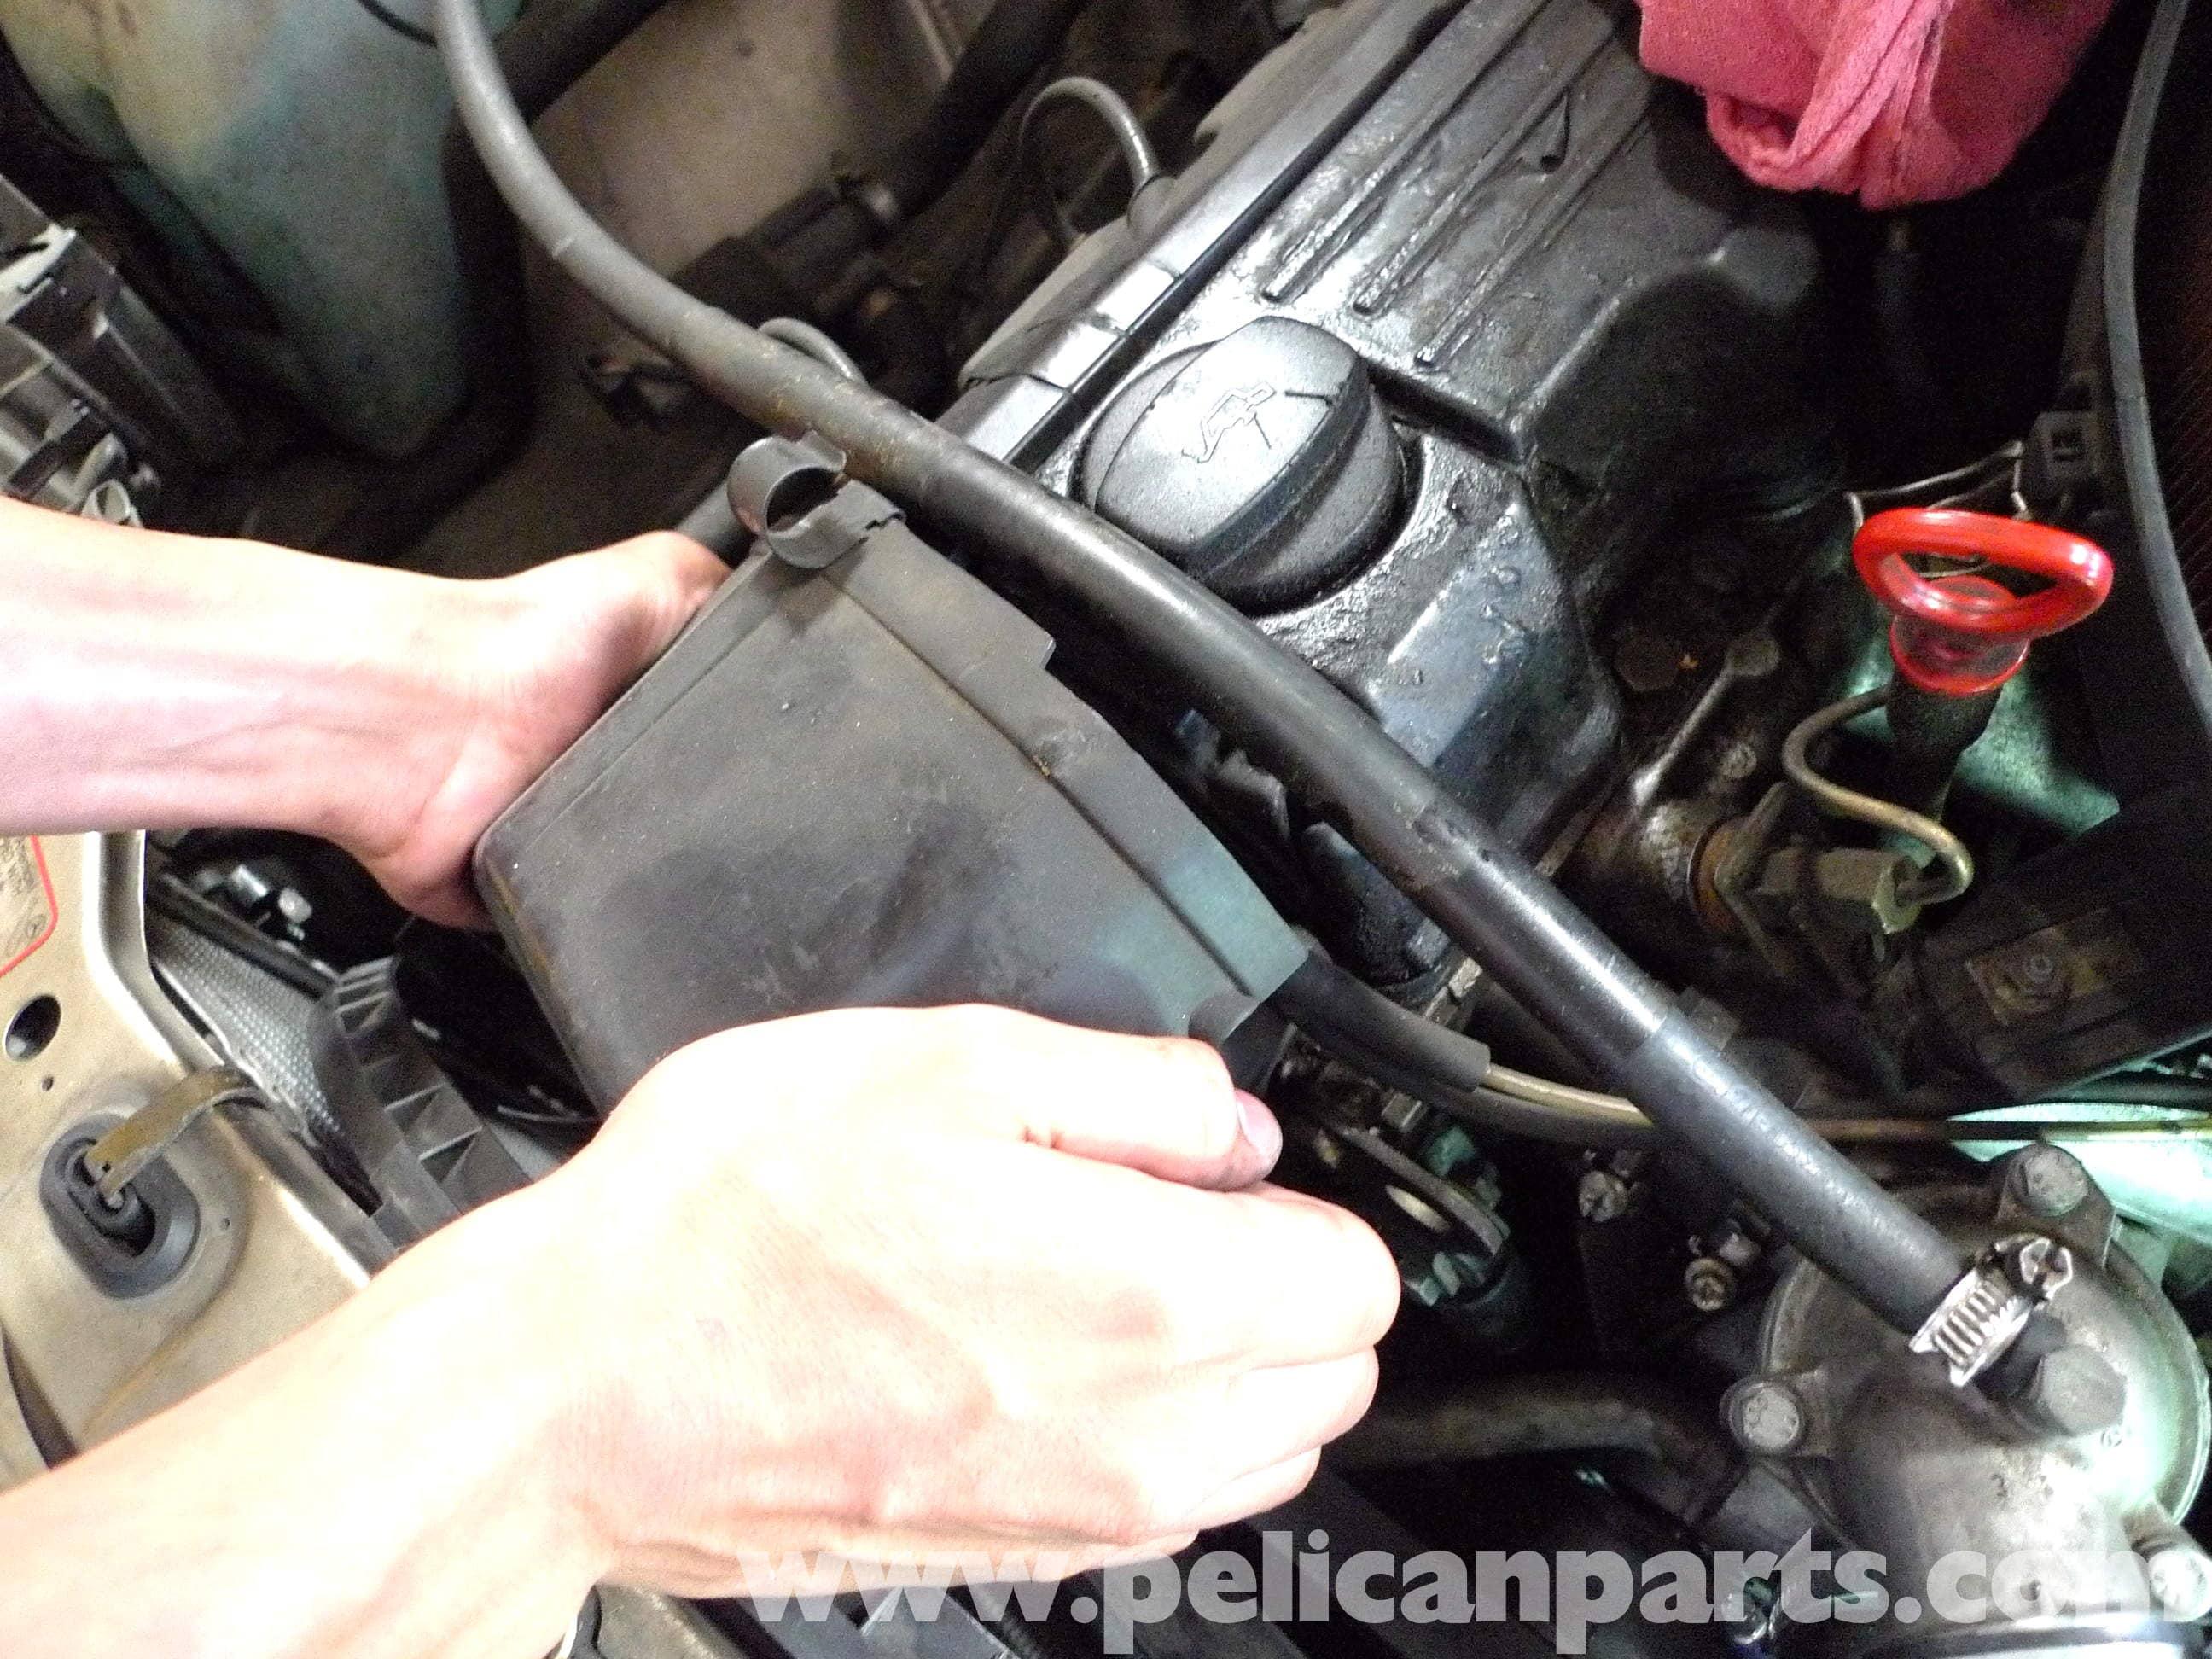 Mercedes      Benz    190E Belt Tensioner Replacement   W201 19871993   Pelican Parts DIY Maintenance